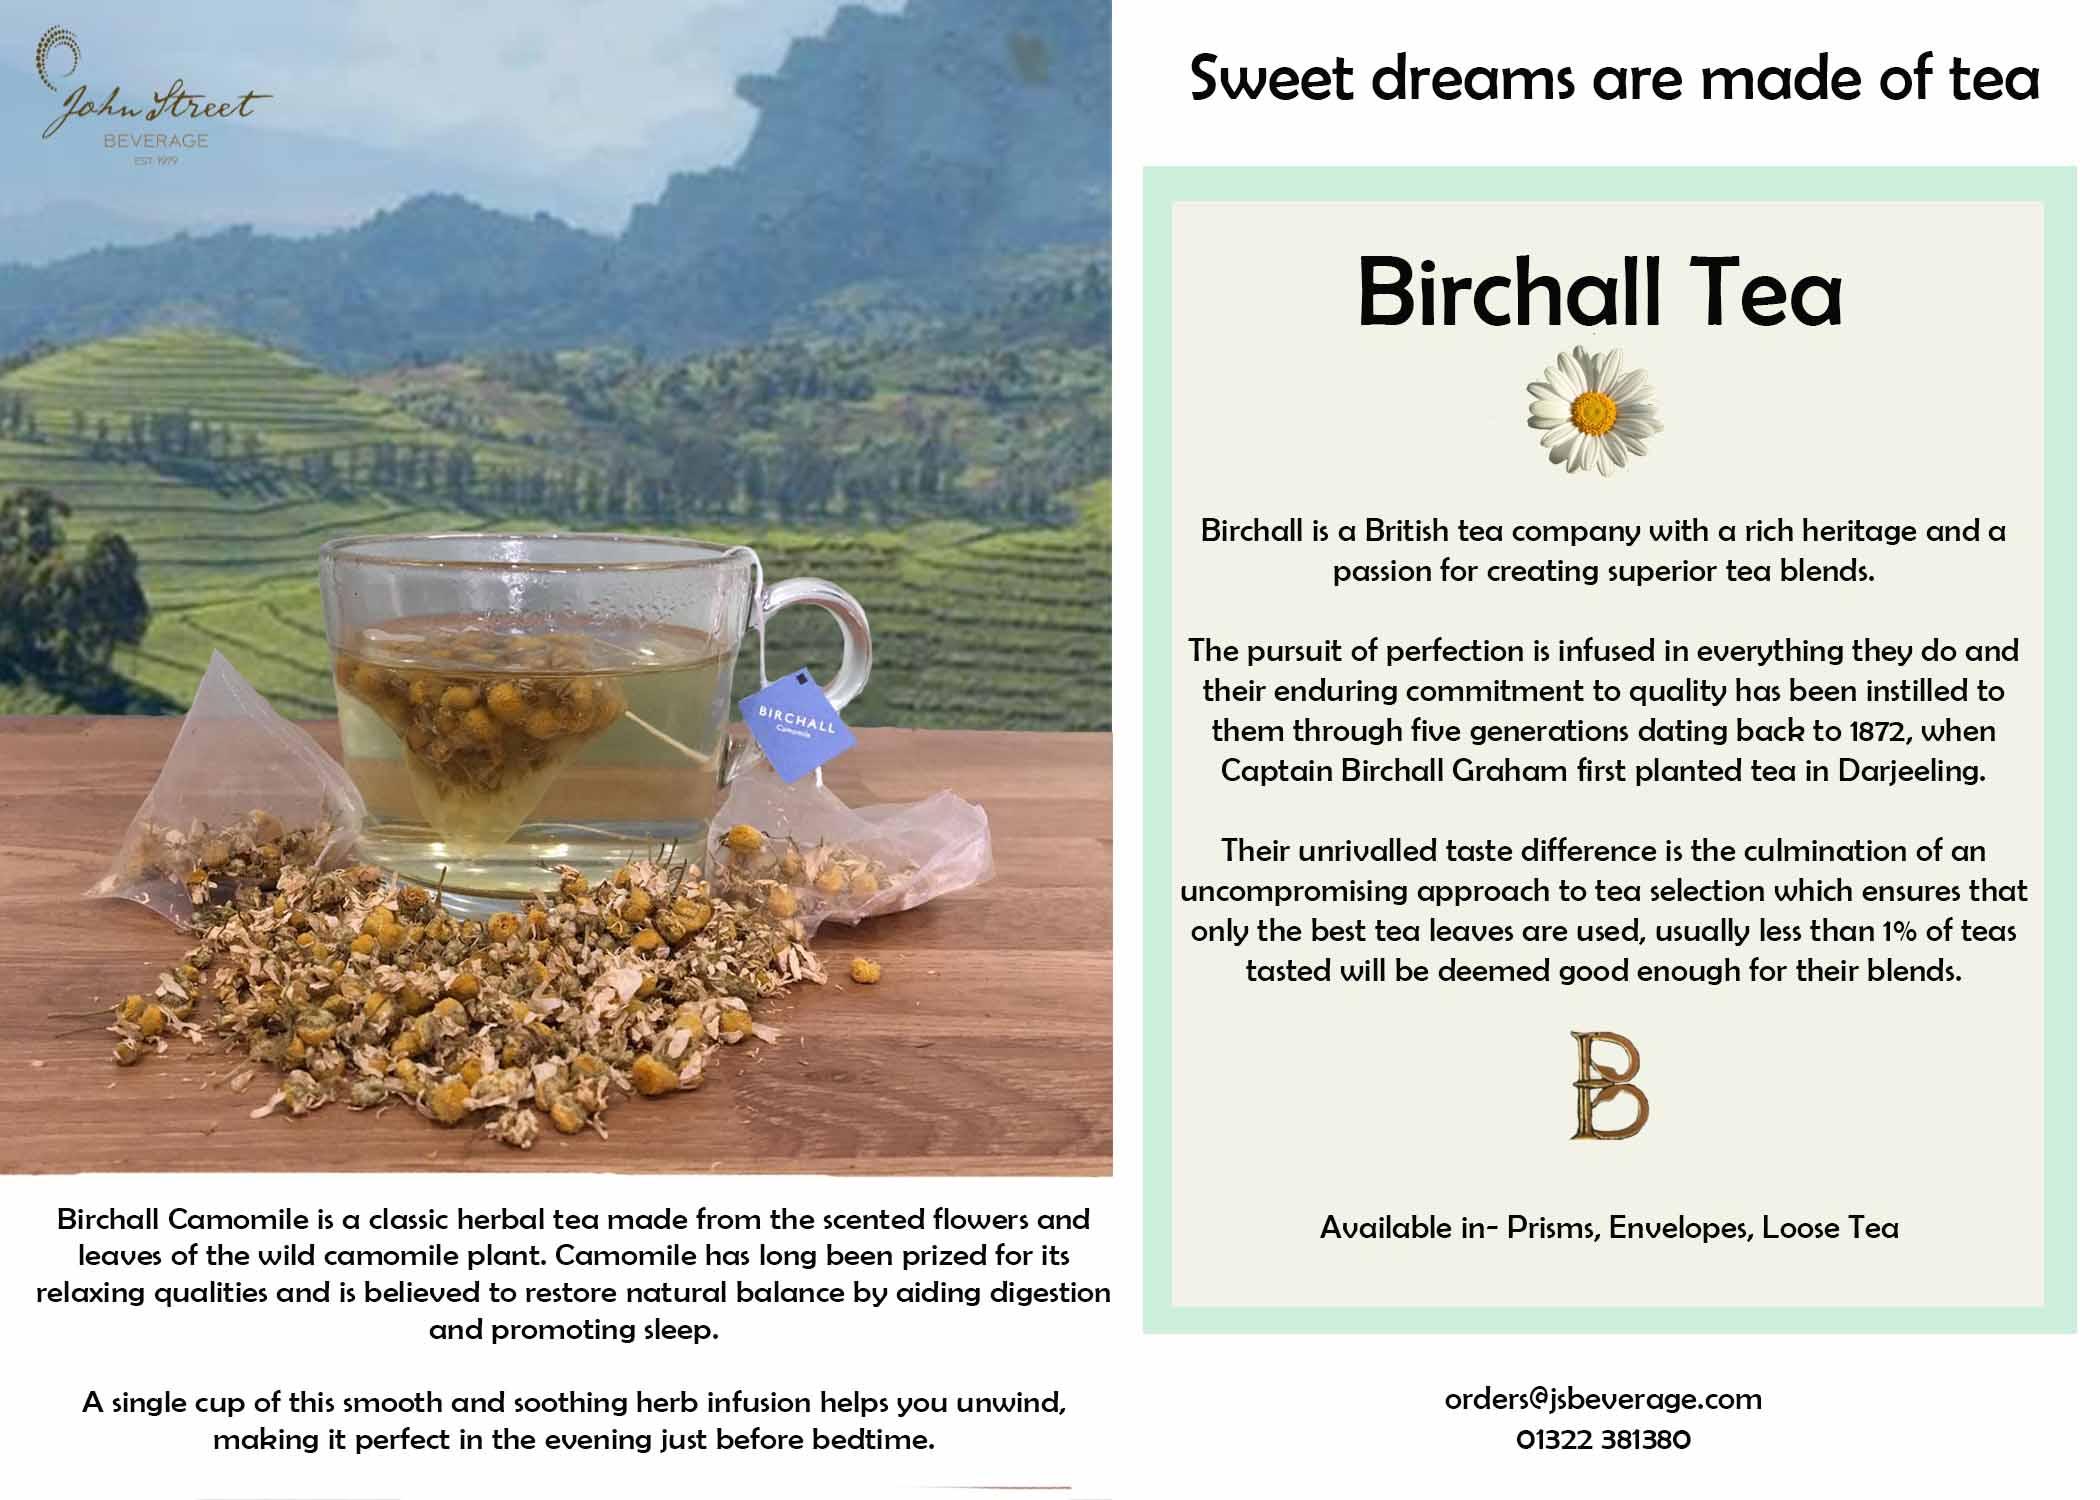 Birchall Camomile